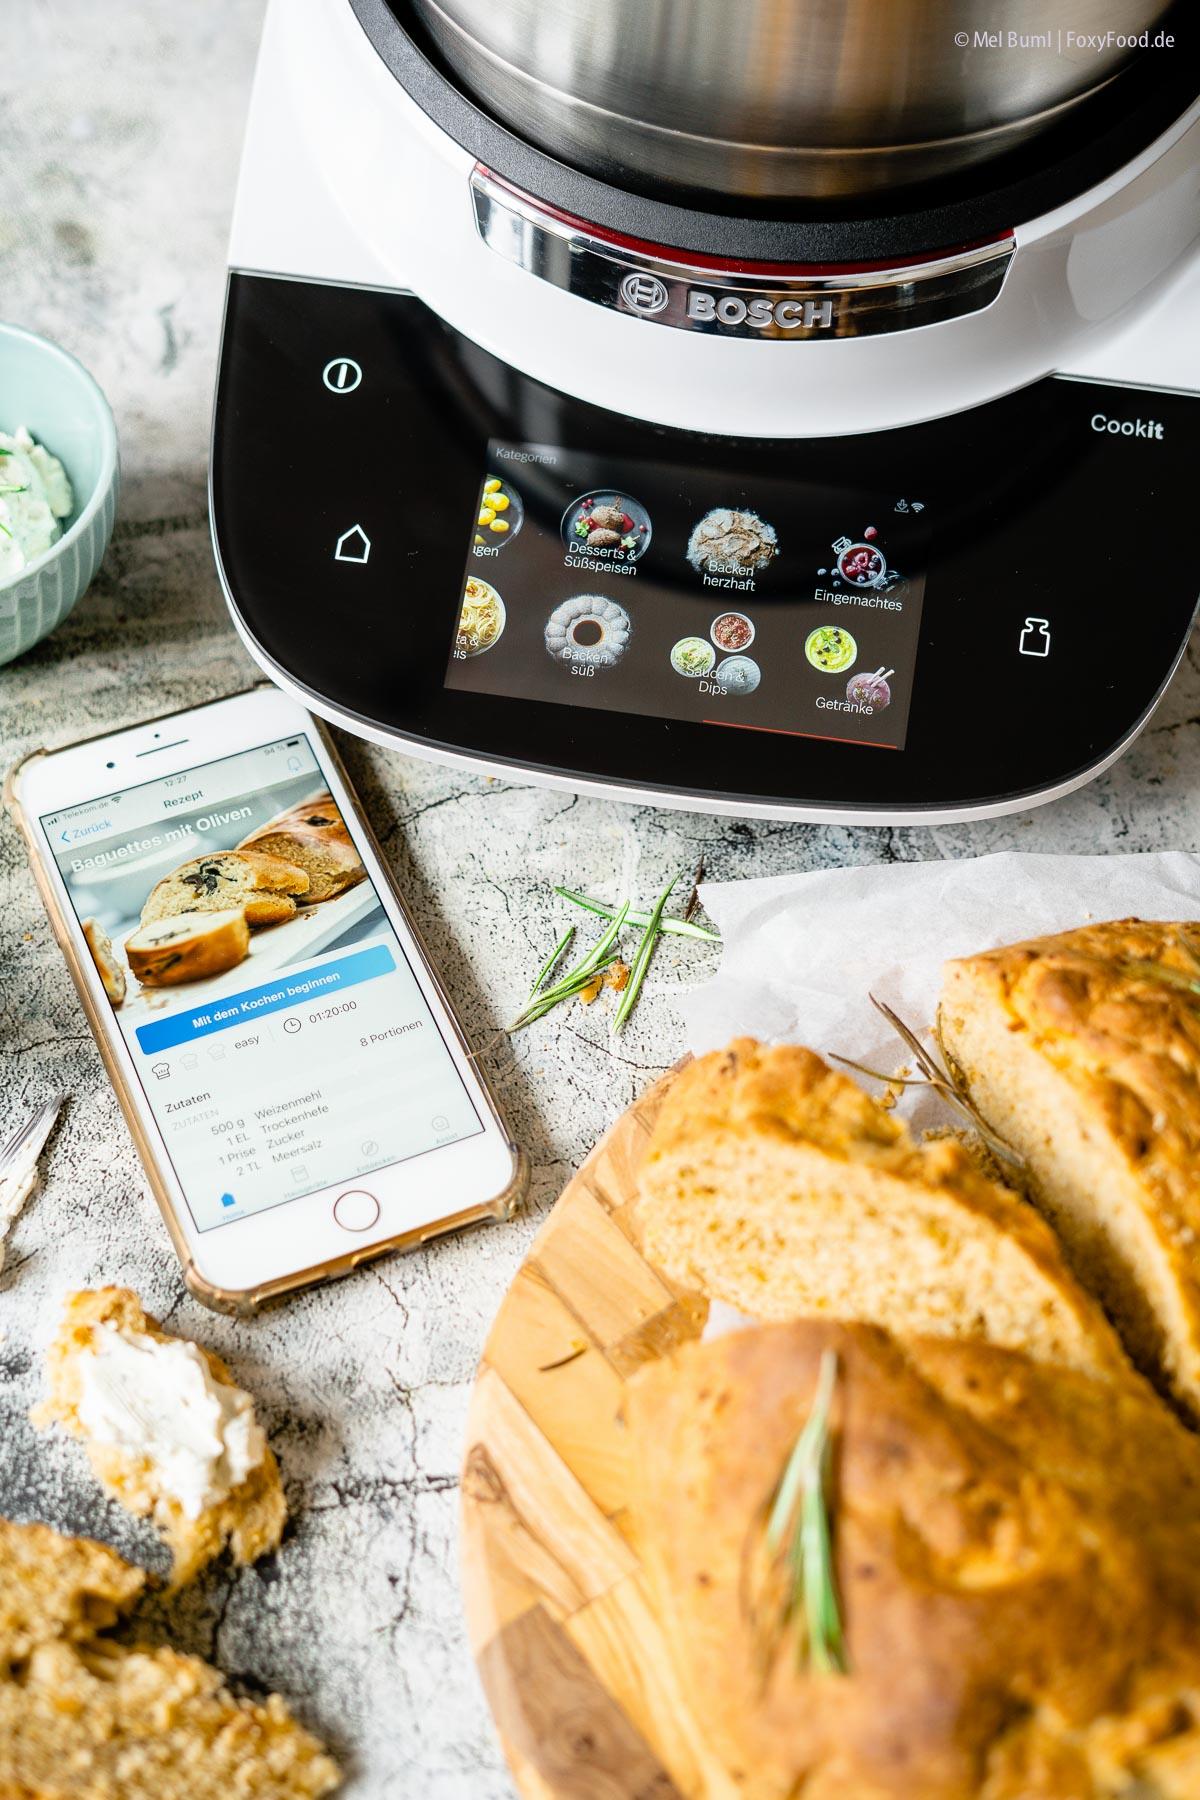 Brotbacken mit dem Bosch Cookit |FoxyFood.de